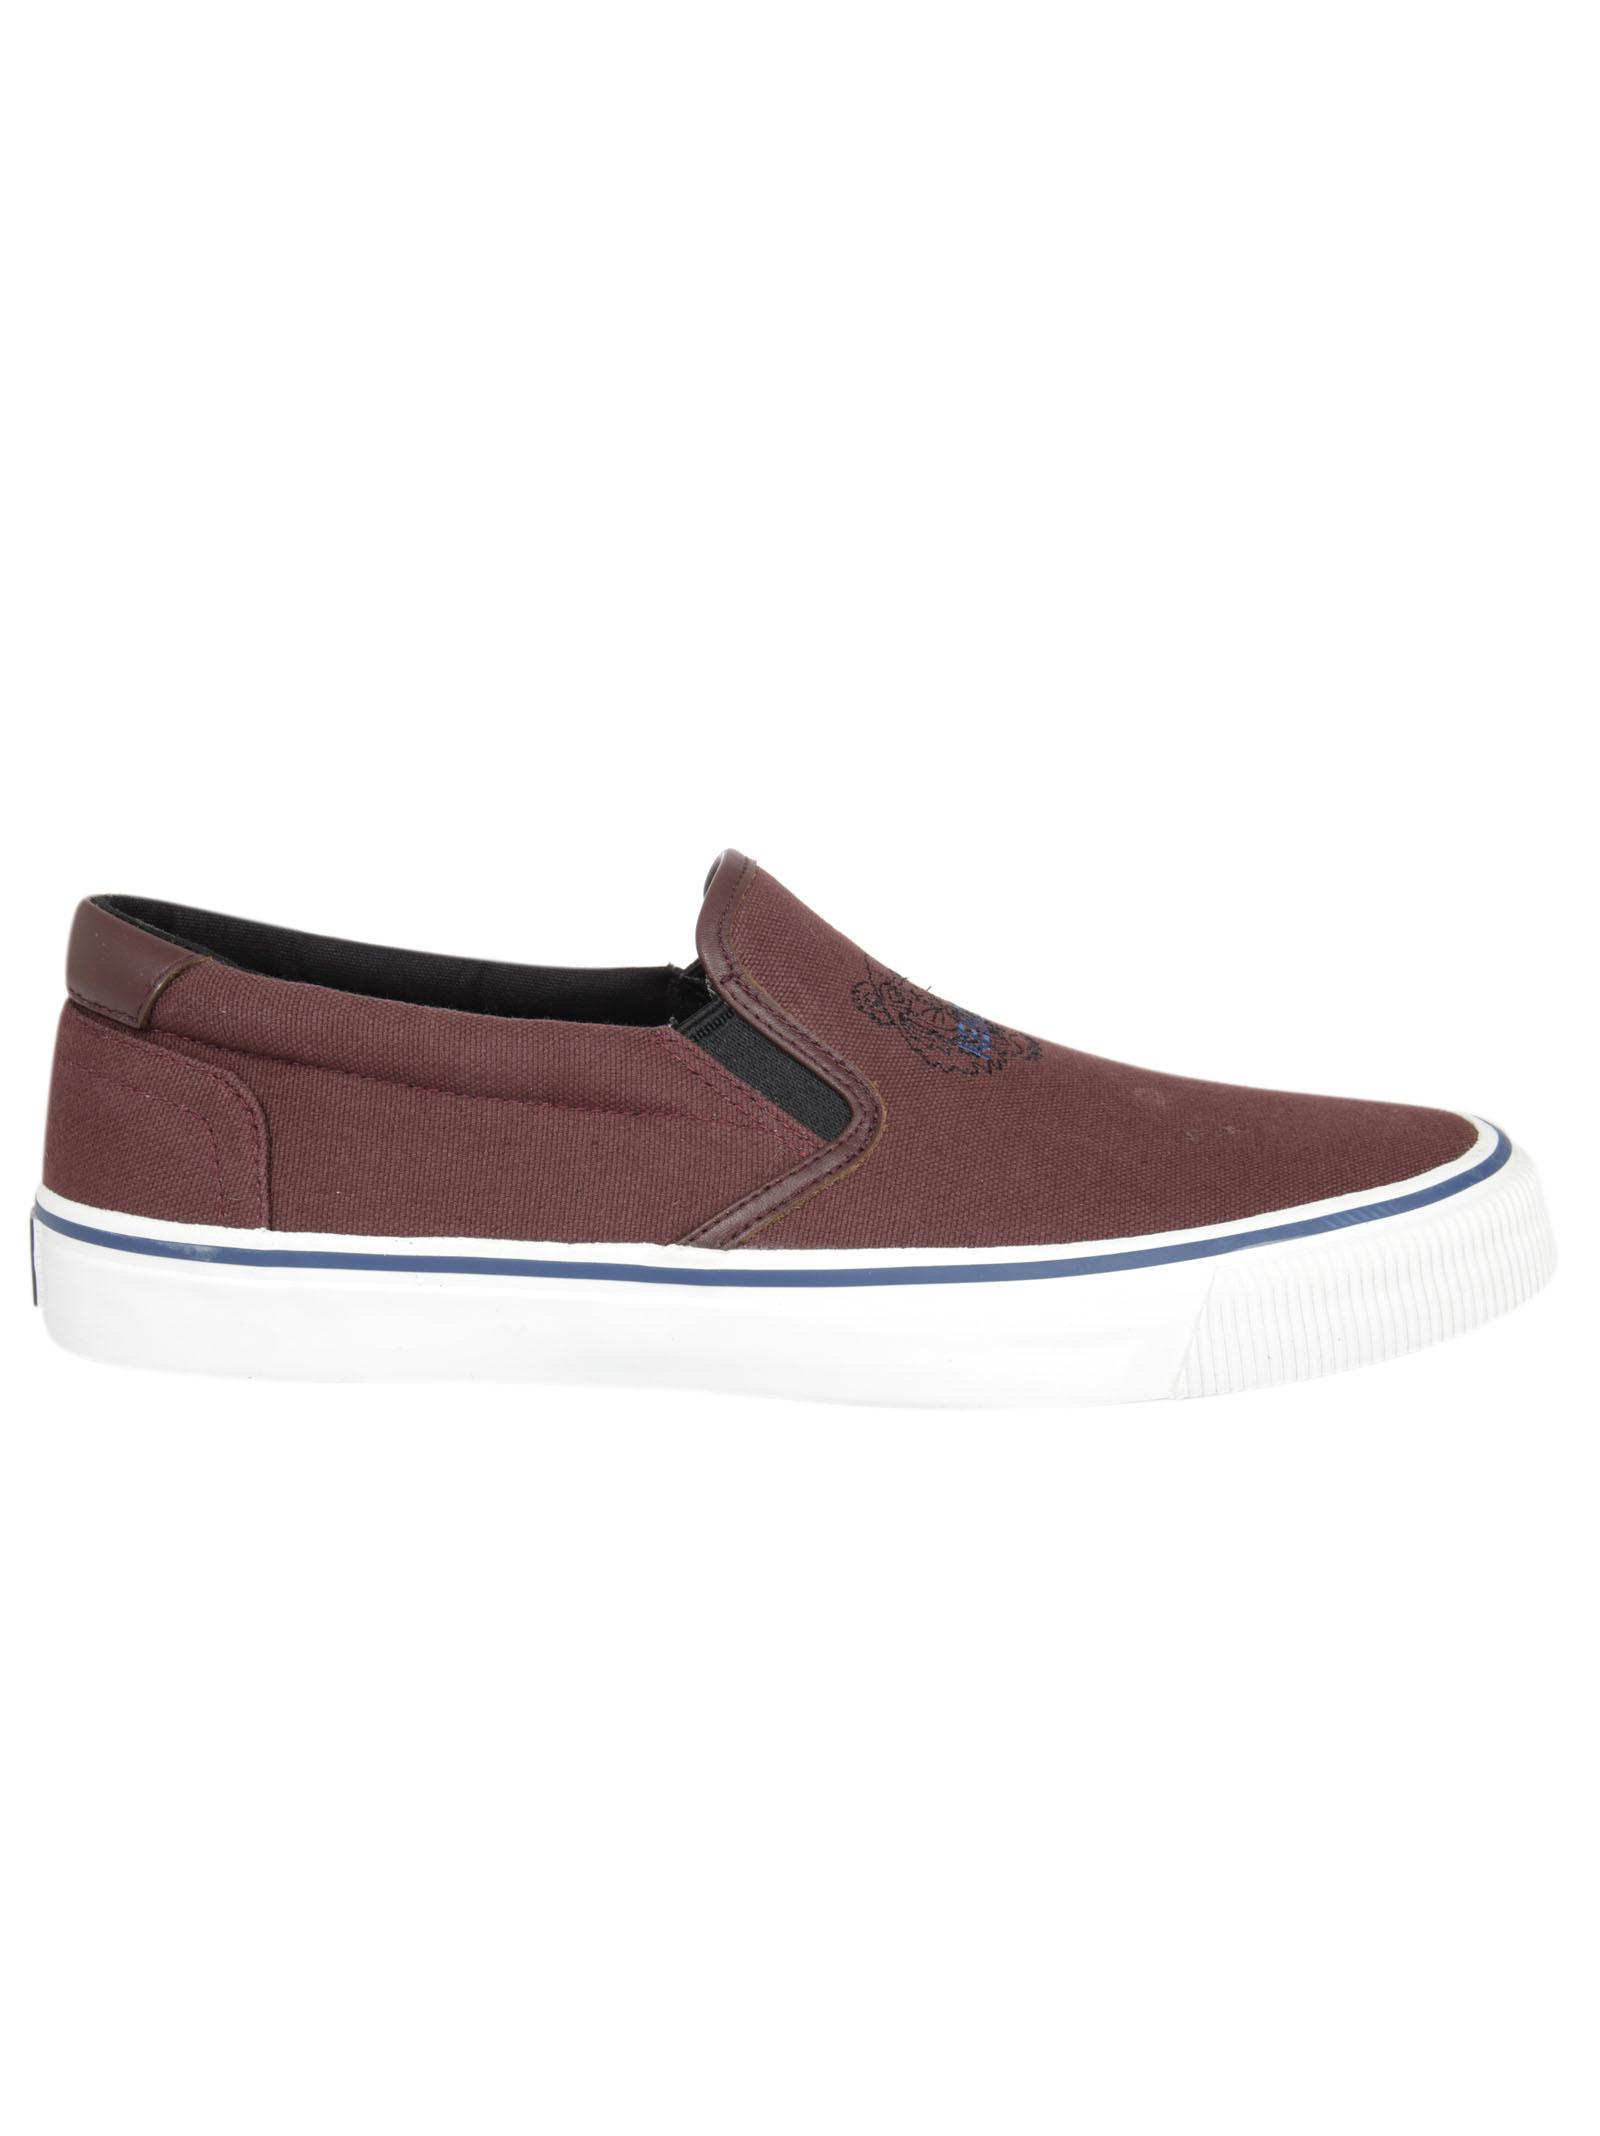 Kenzo Kenzo Tiger Slip-On Sneakers